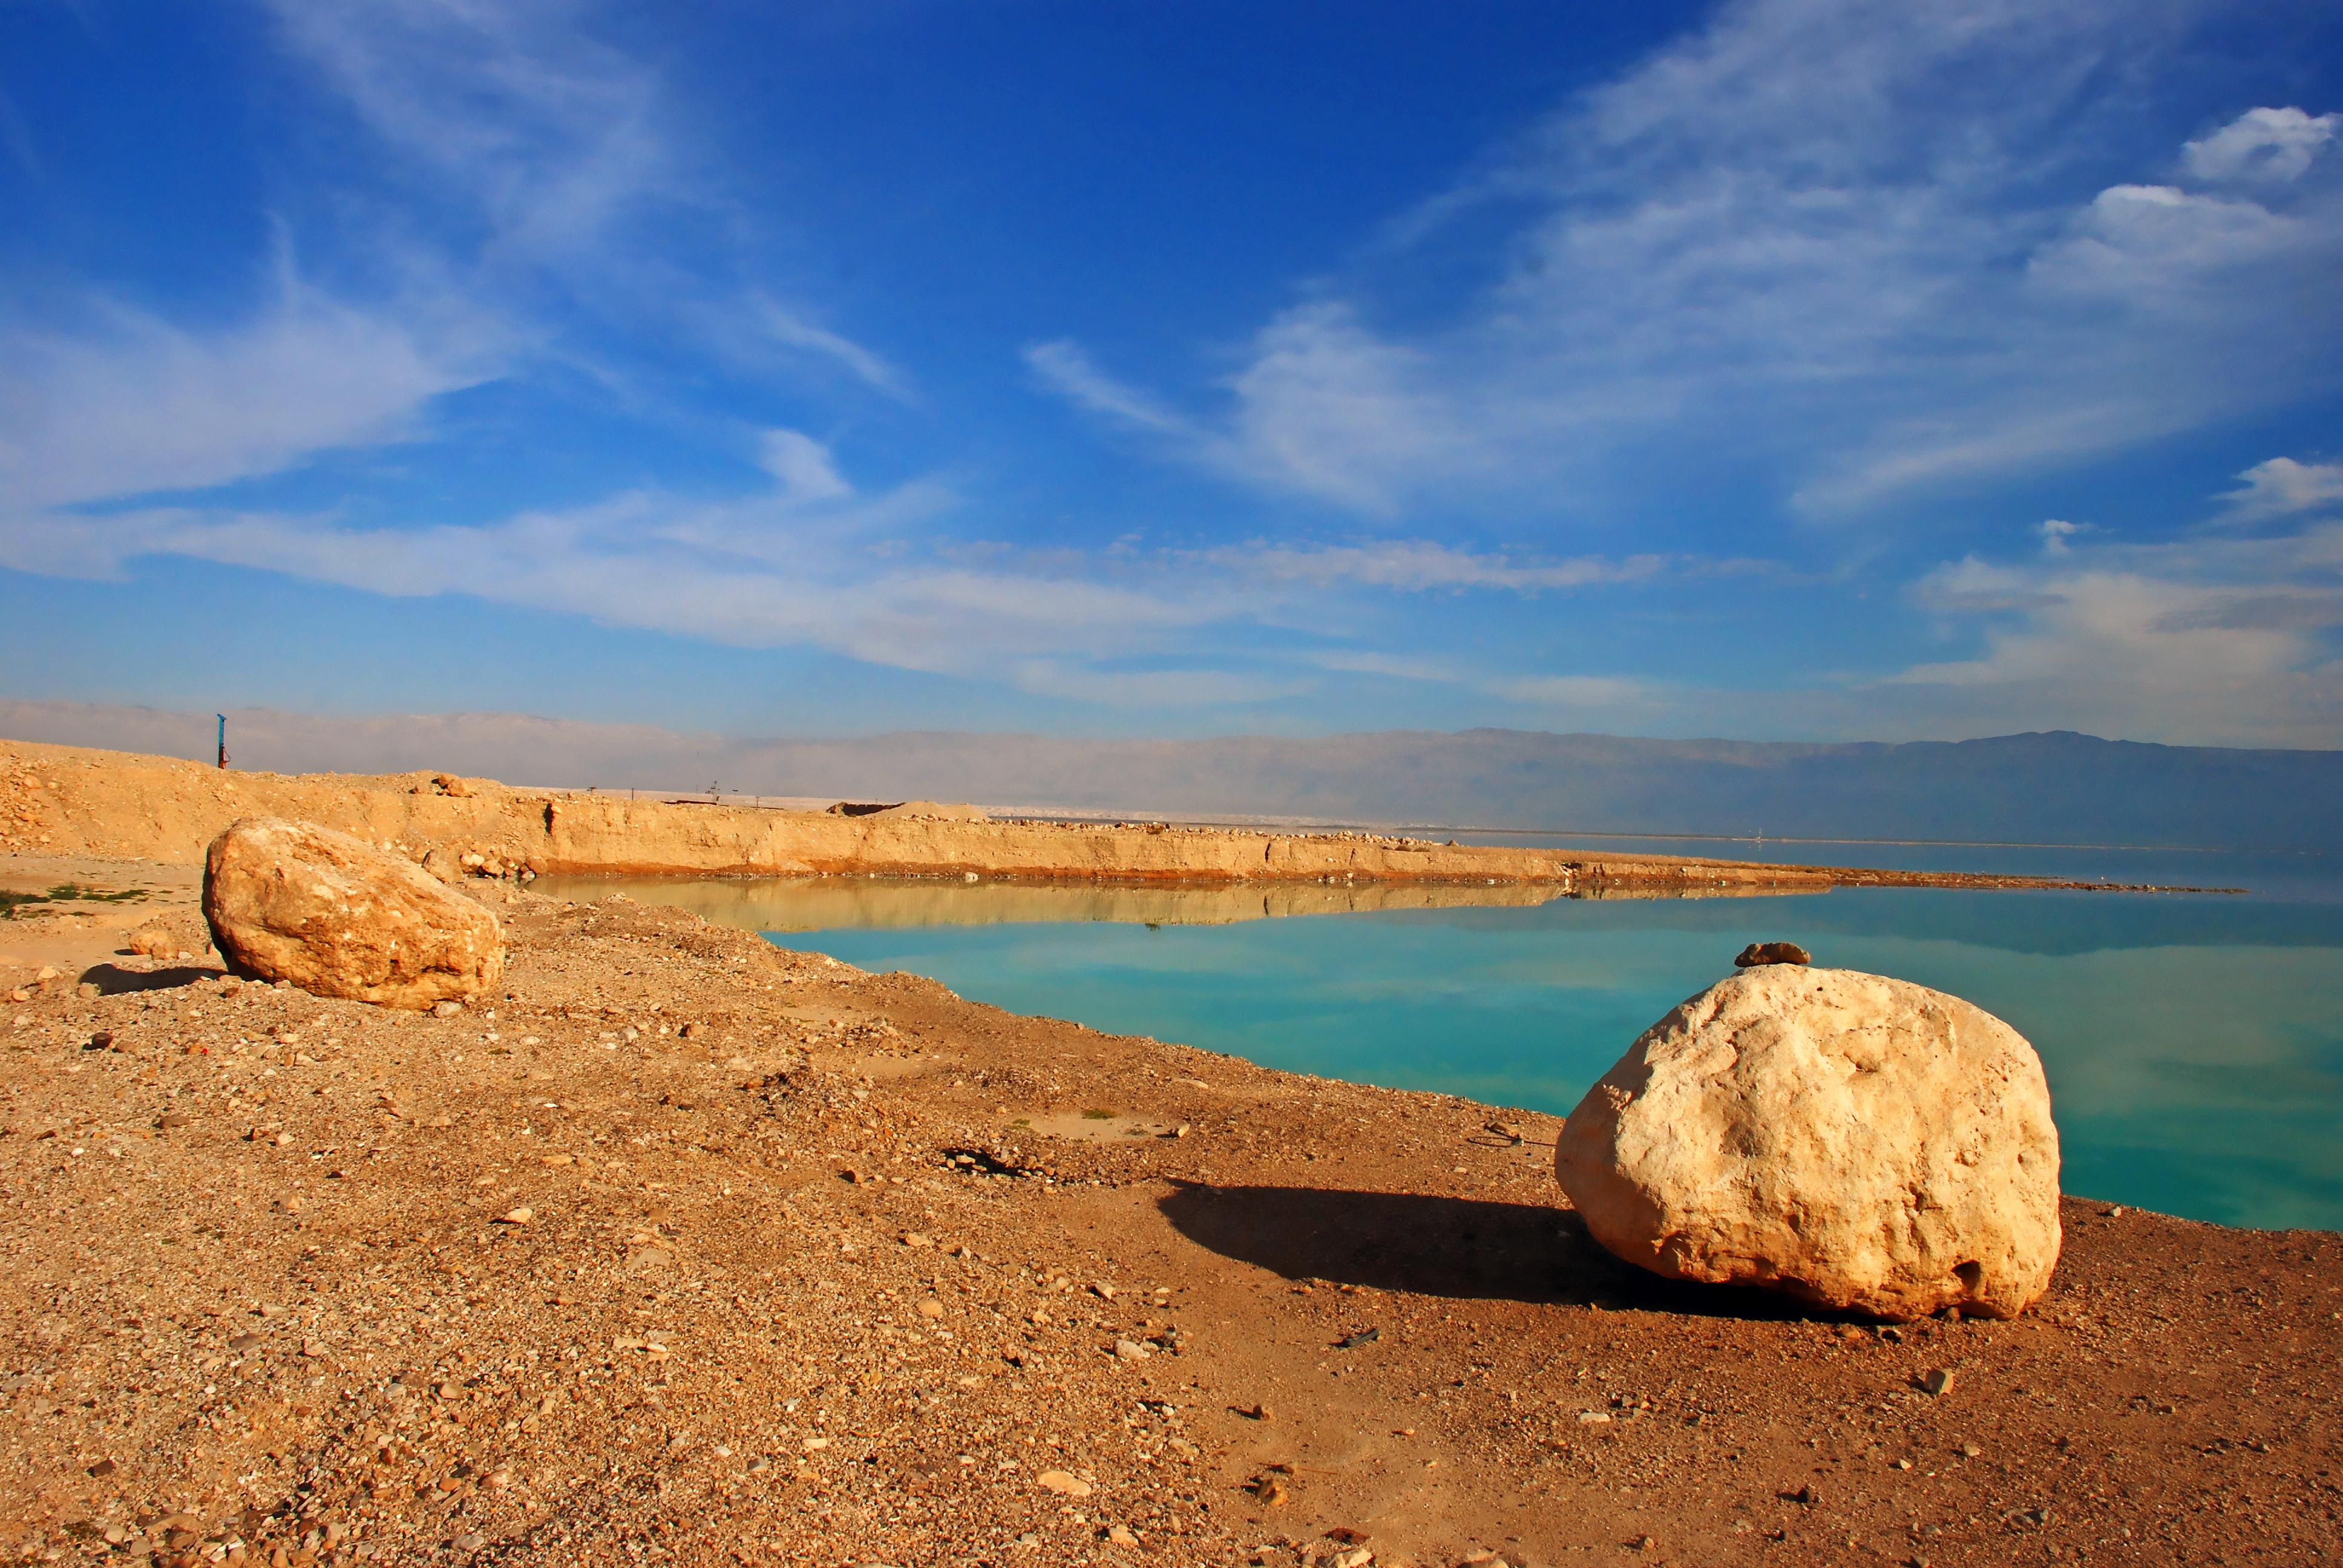 Stones at coast of Dead Sea, Palestine